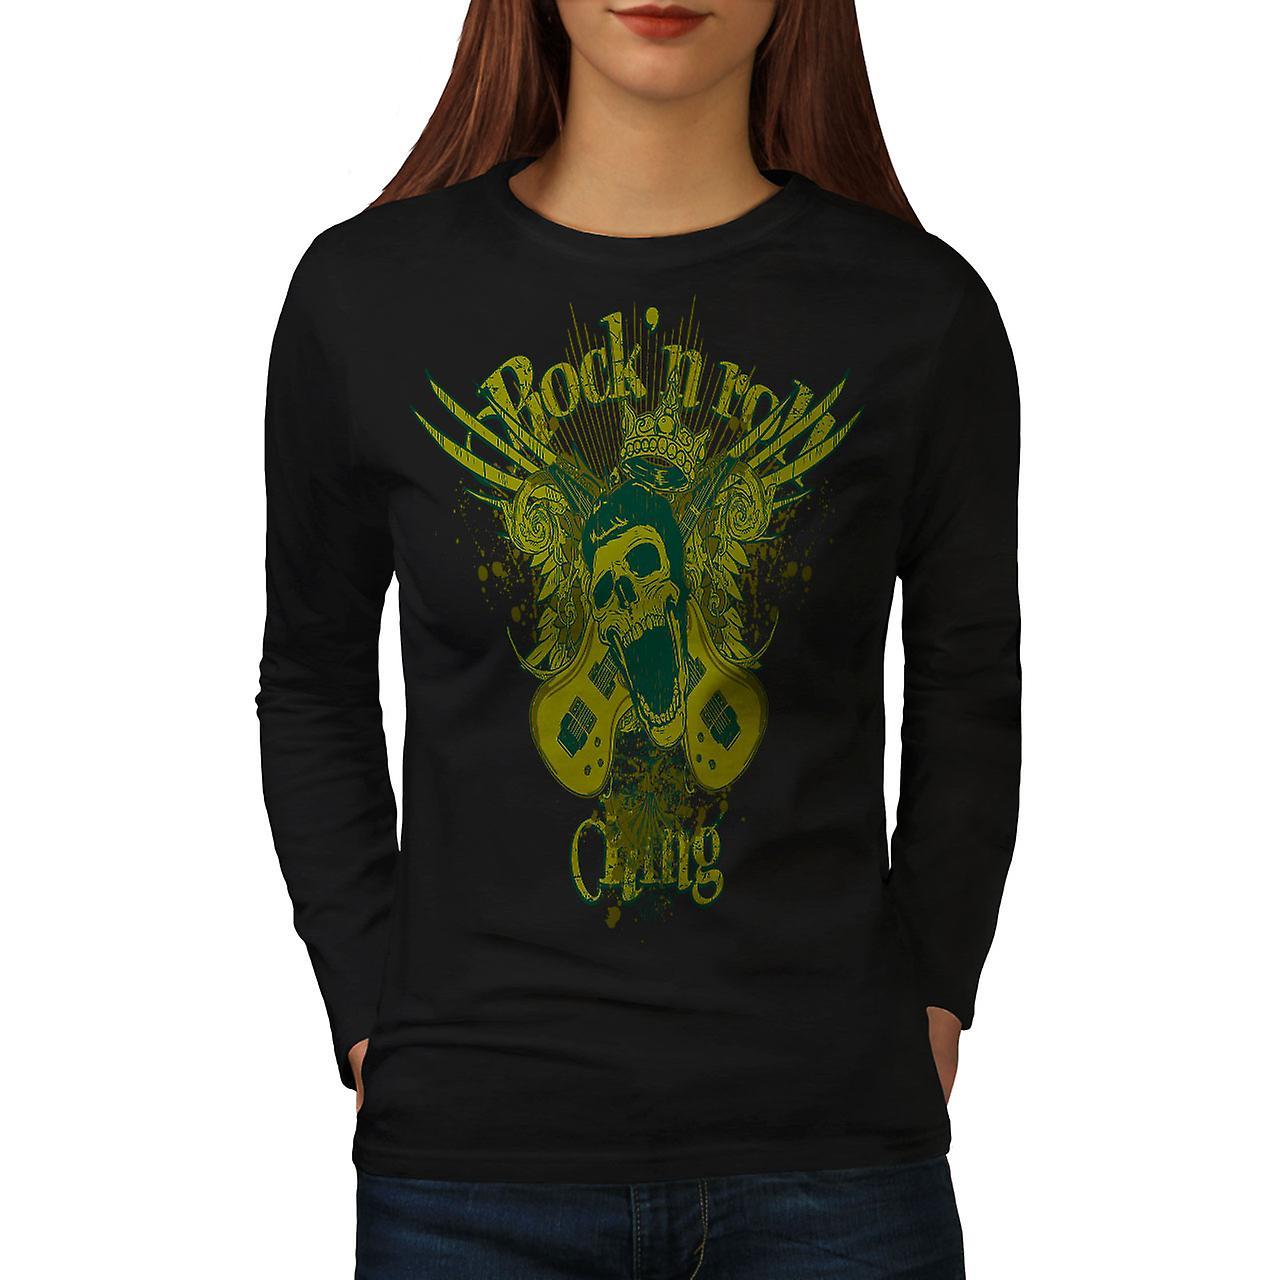 Rock N Roll Gang Music Women Black Long Sleeve T-shirt | Wellcoda